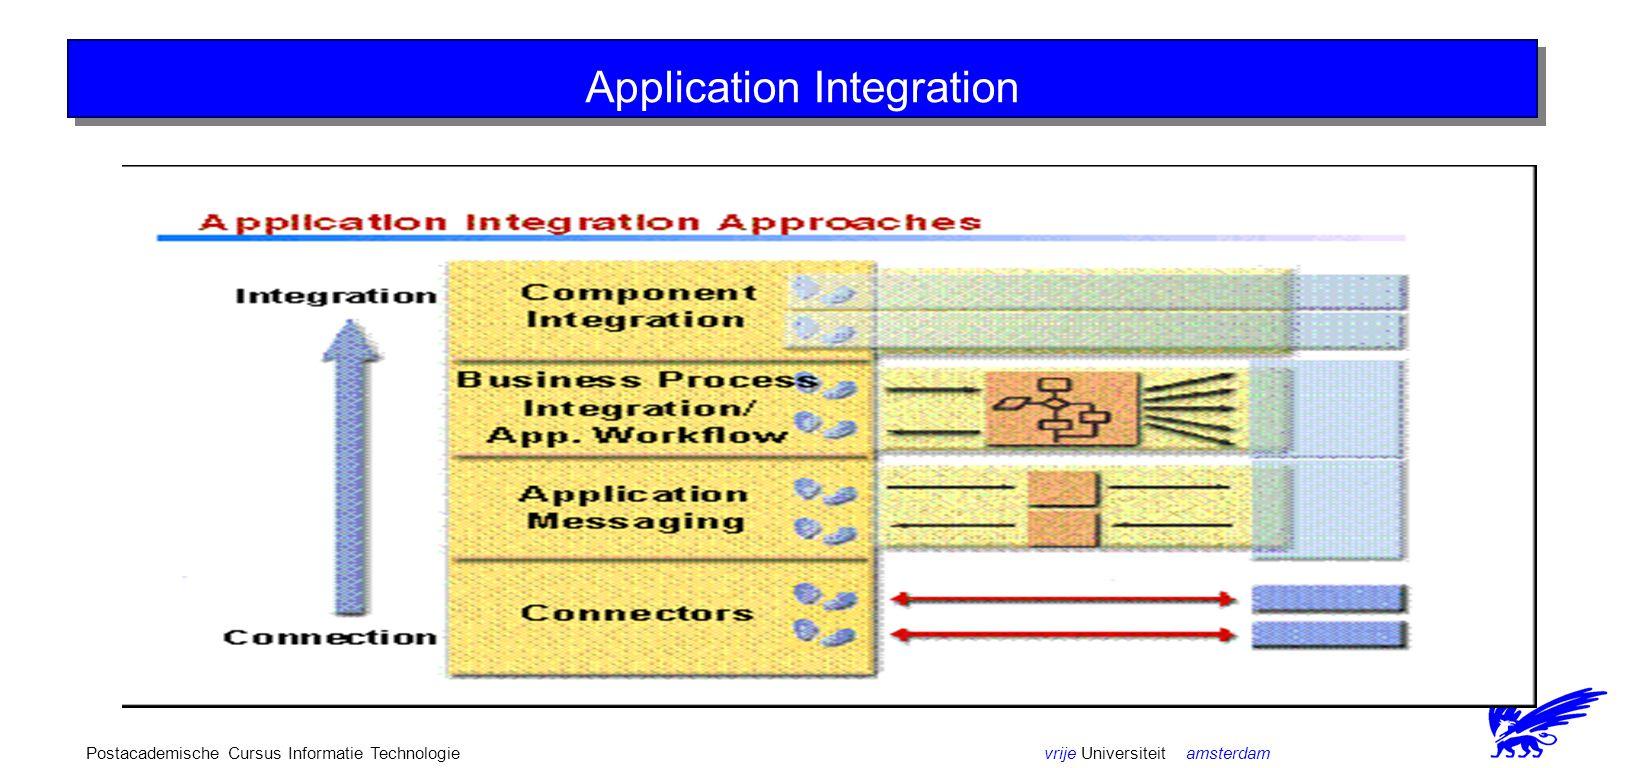 vrije Universiteit amsterdamPostacademische Cursus Informatie Technologie Application Integration